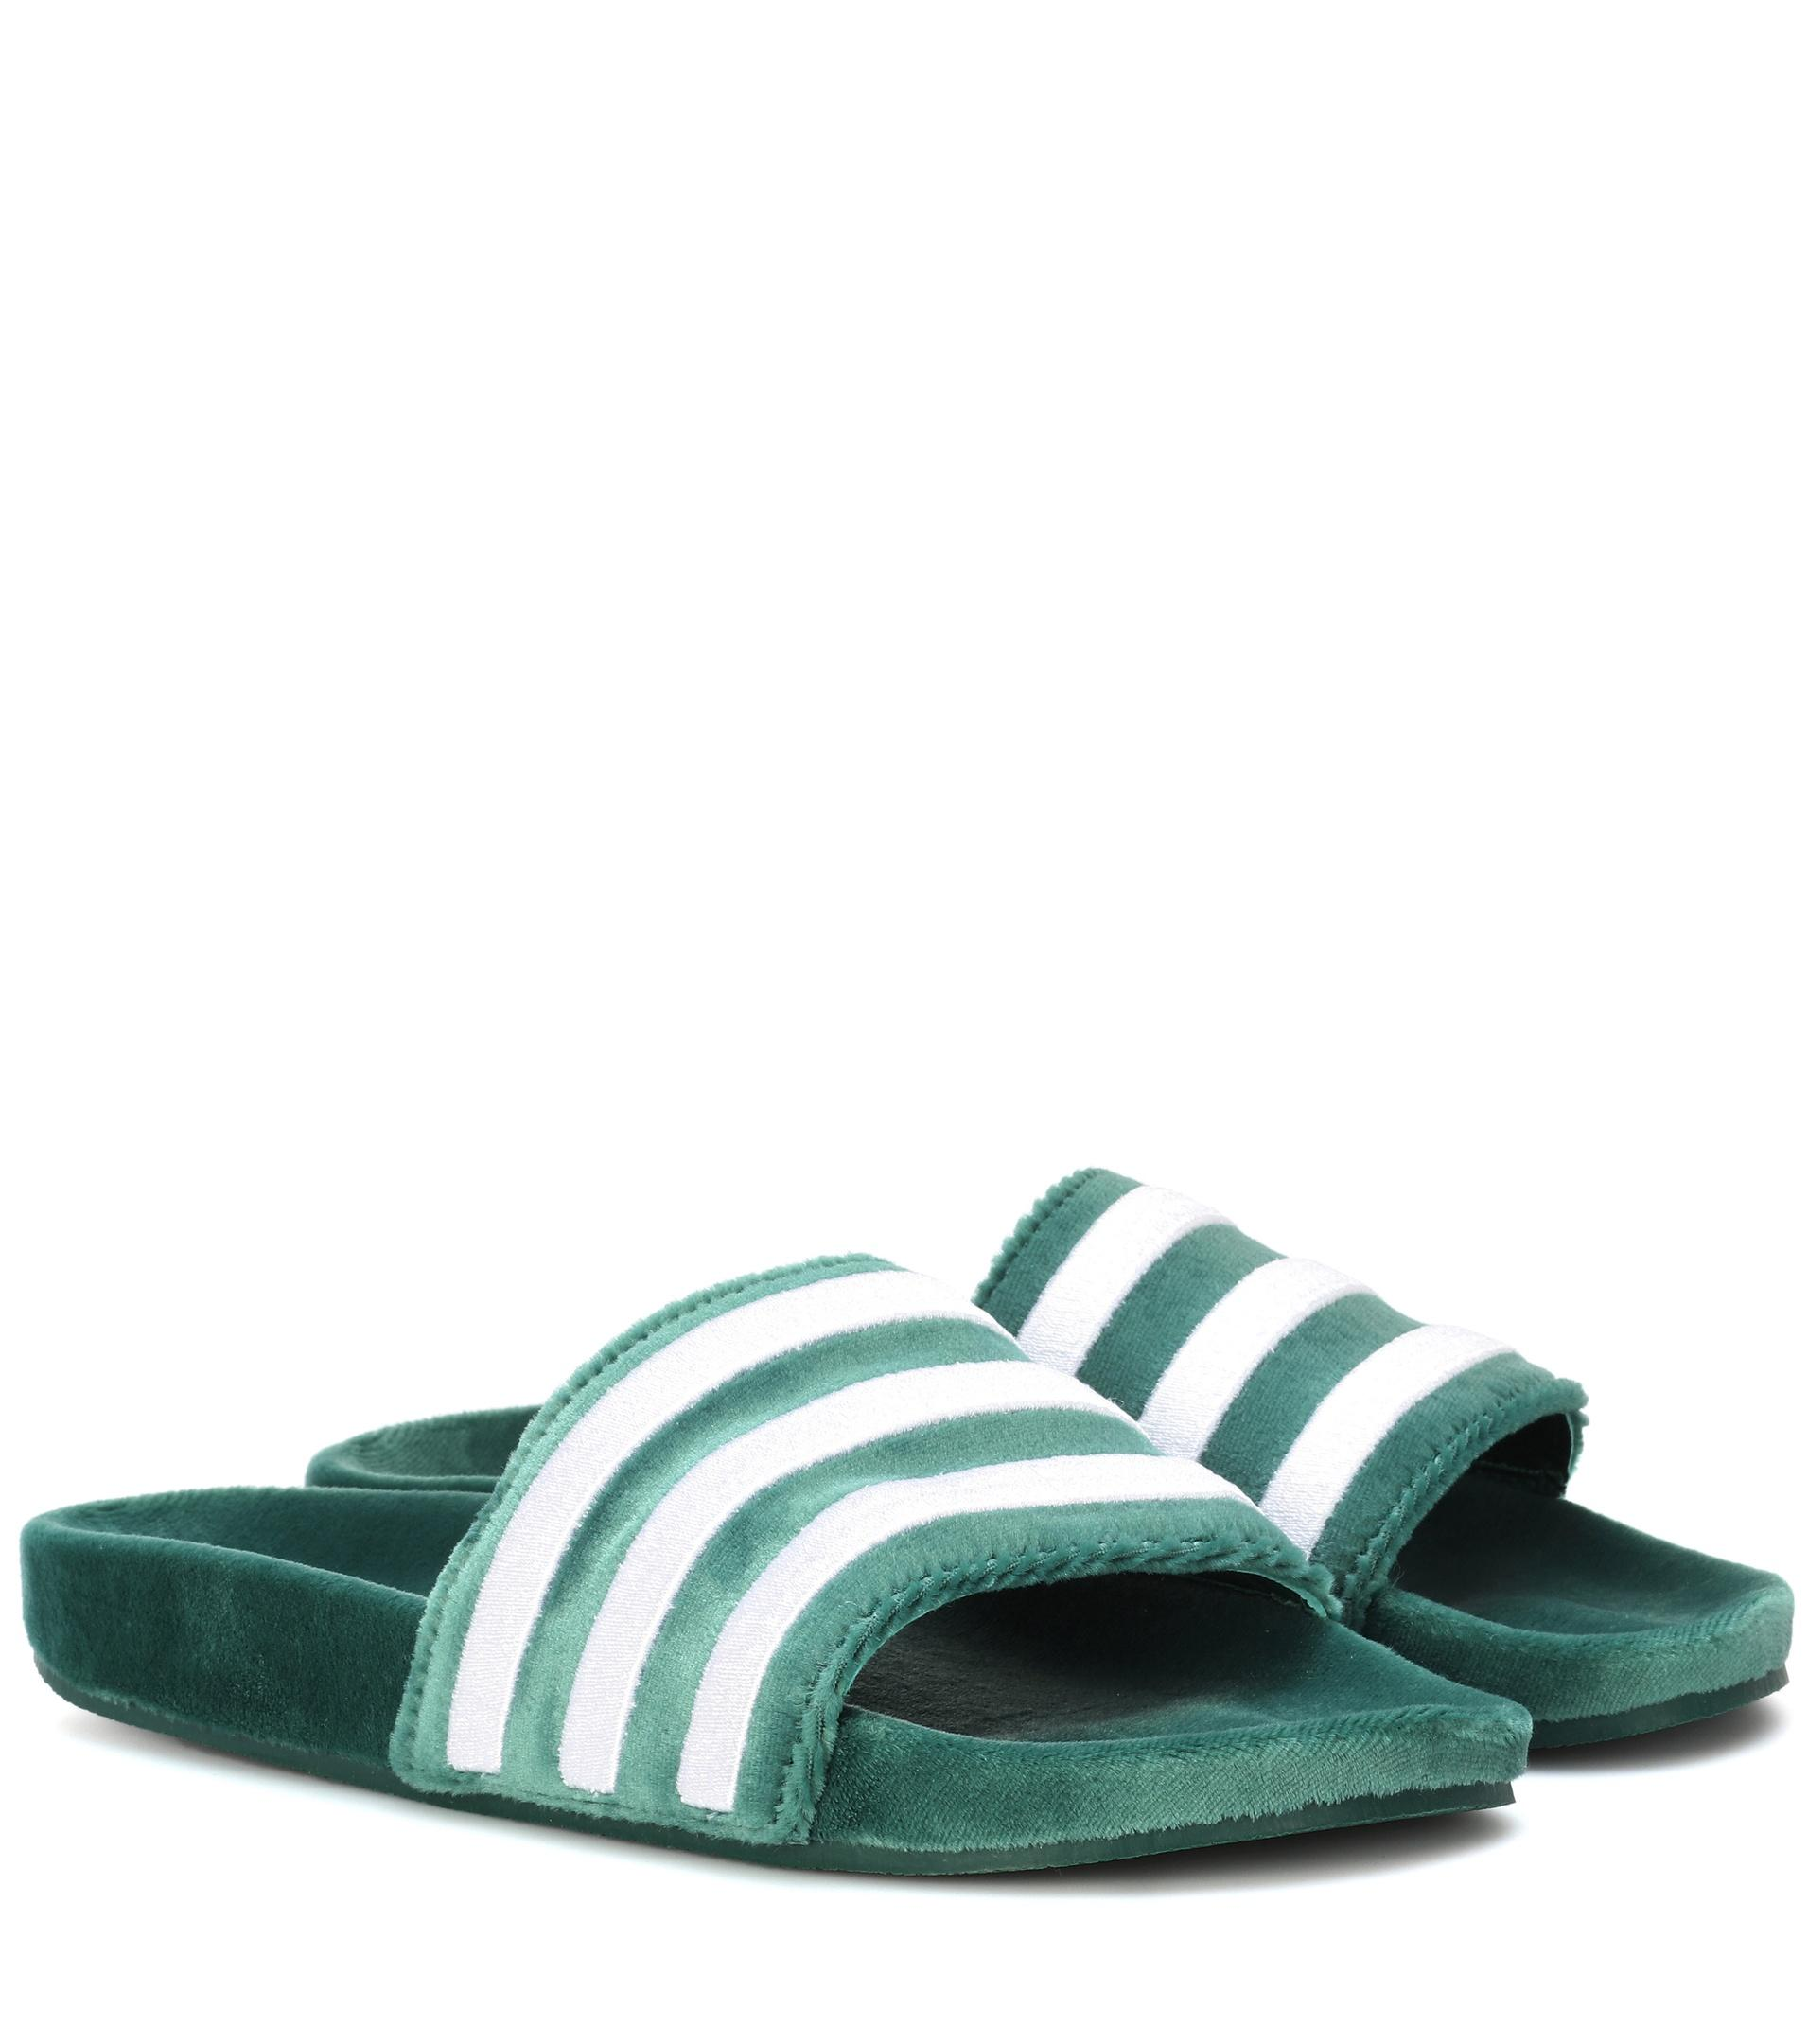 c7d21b0cc1480 Lyst - adidas Originals Adilette Velvet Slide in Green